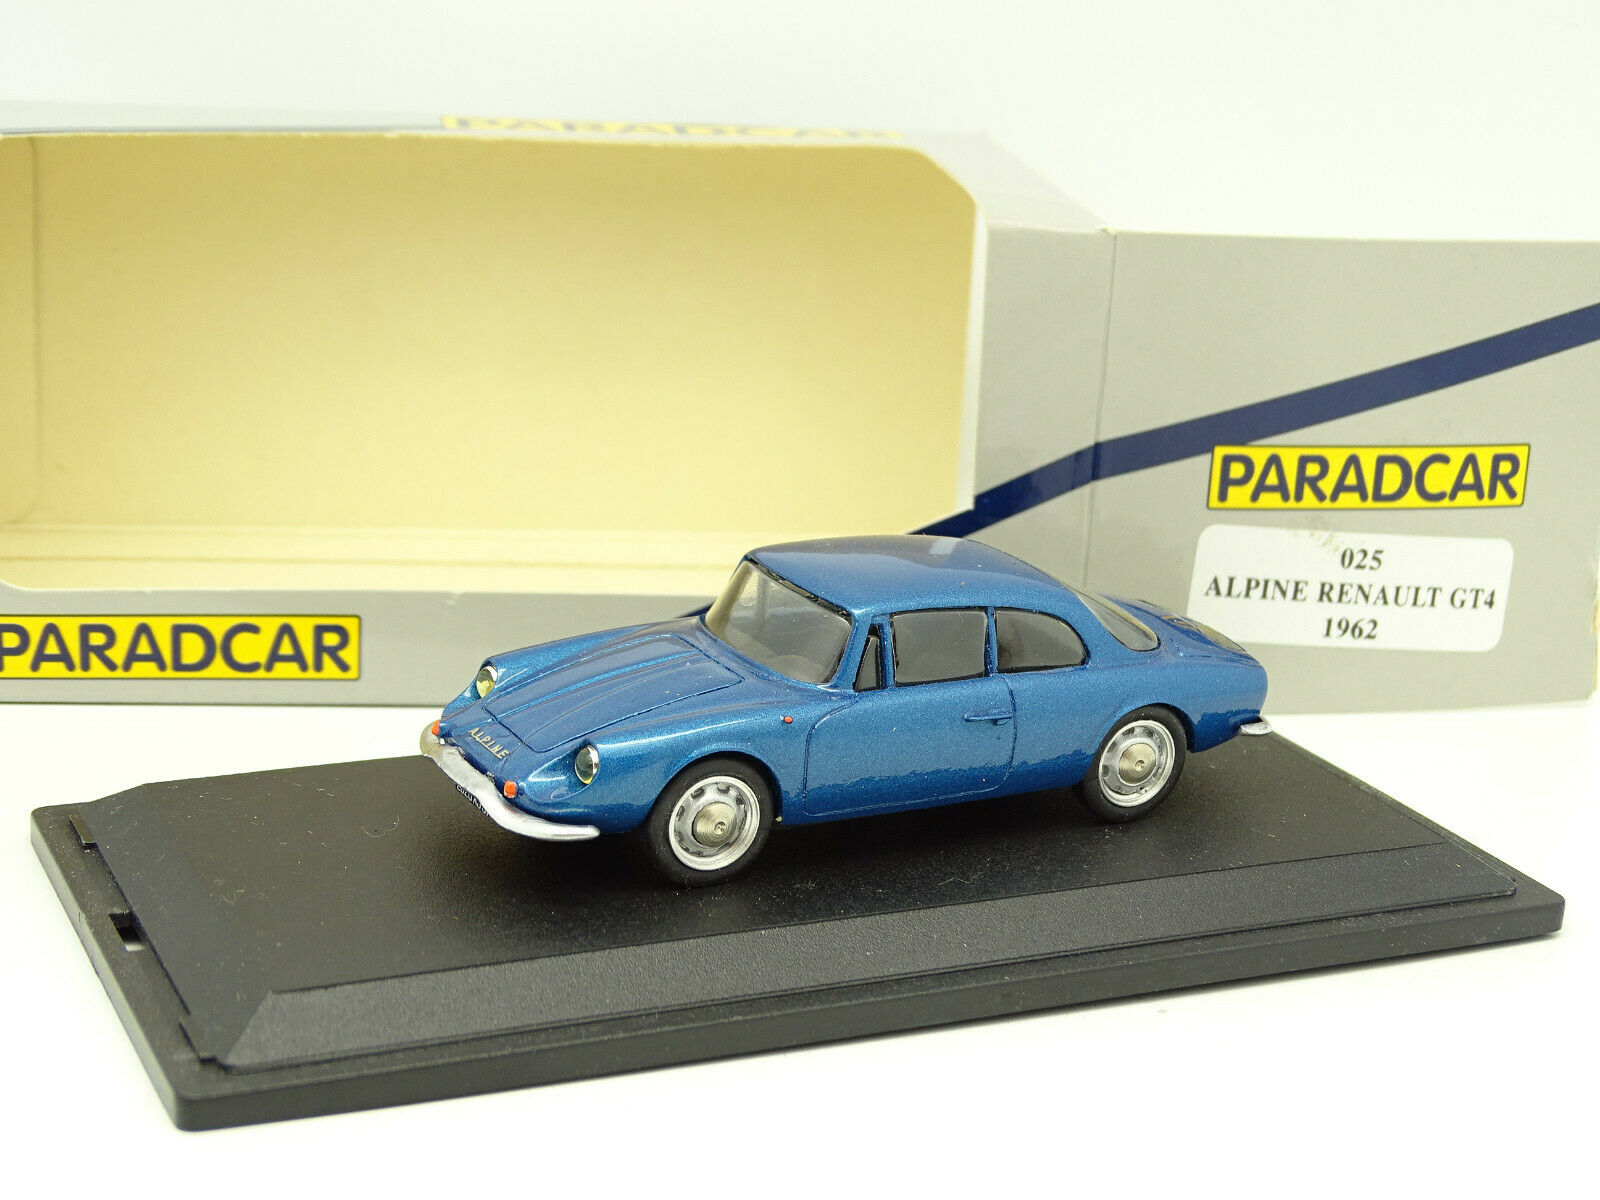 Paradcar 1 43 - Alpine Renault GT4 1962 bluee